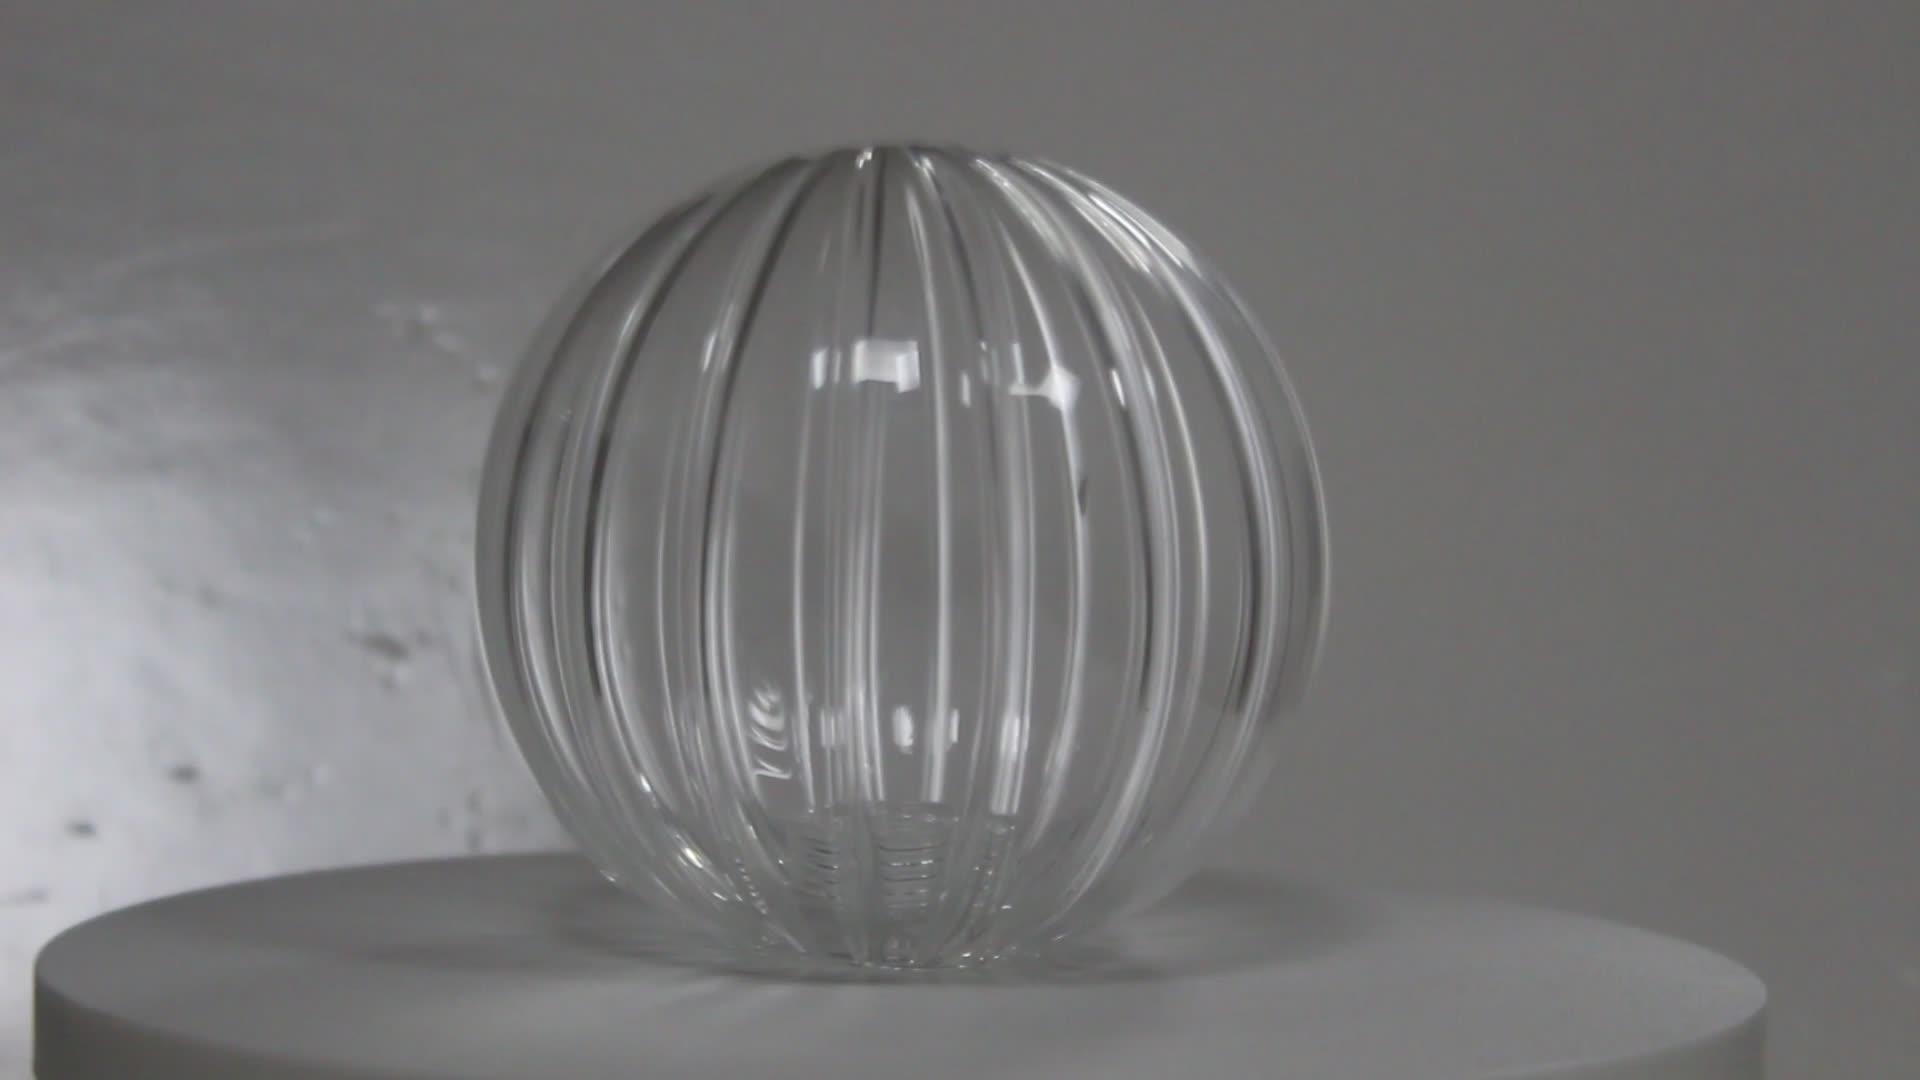 Fabriek Prijs Draad Transparant Borosilicaatglas Bal Lampenkap Groothandel